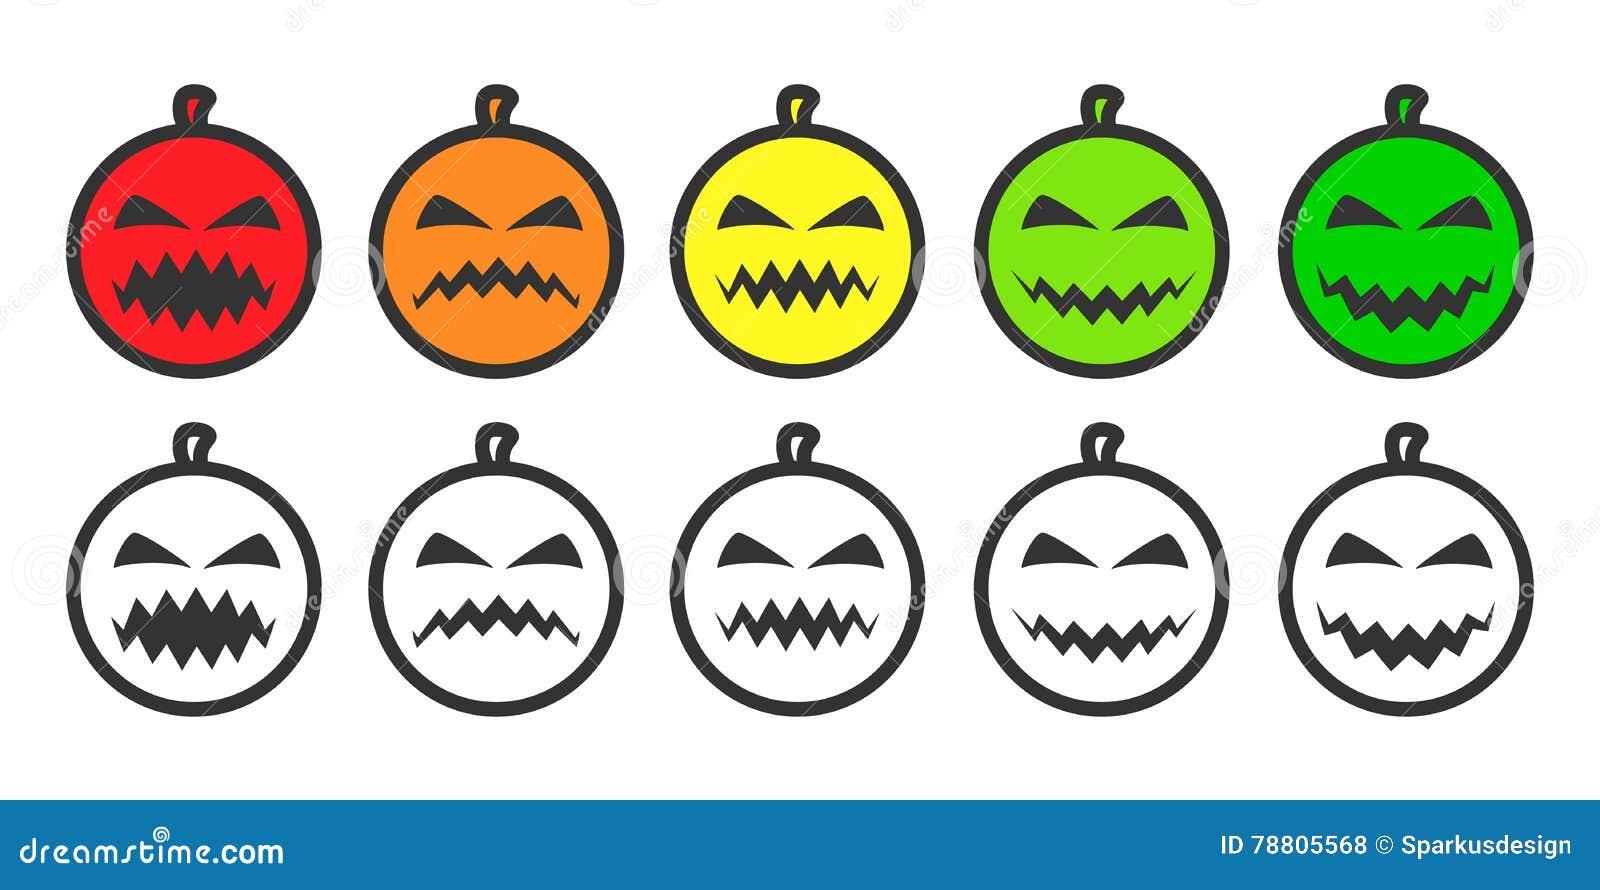 Halloween Pumpkin Emoji Icons Vector Illustration